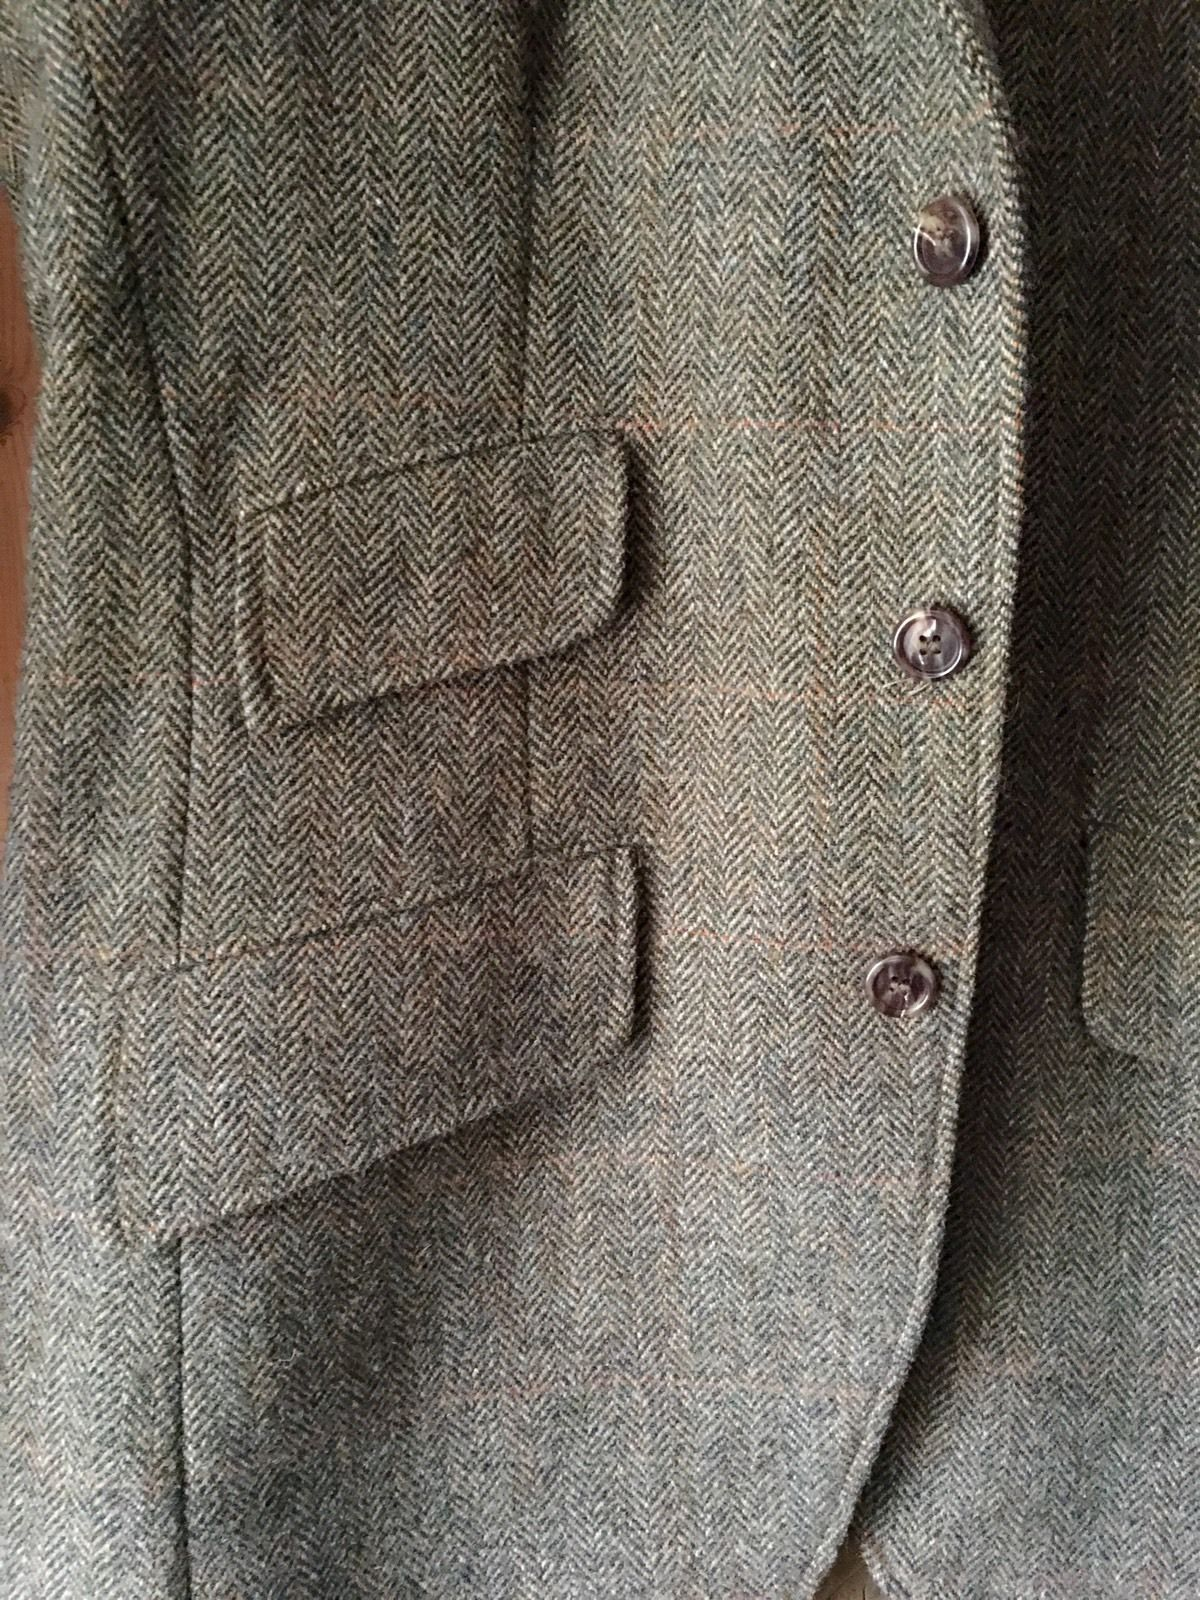 Vintage Orvis Tweed Jacket Hacking Hunting Country Riding